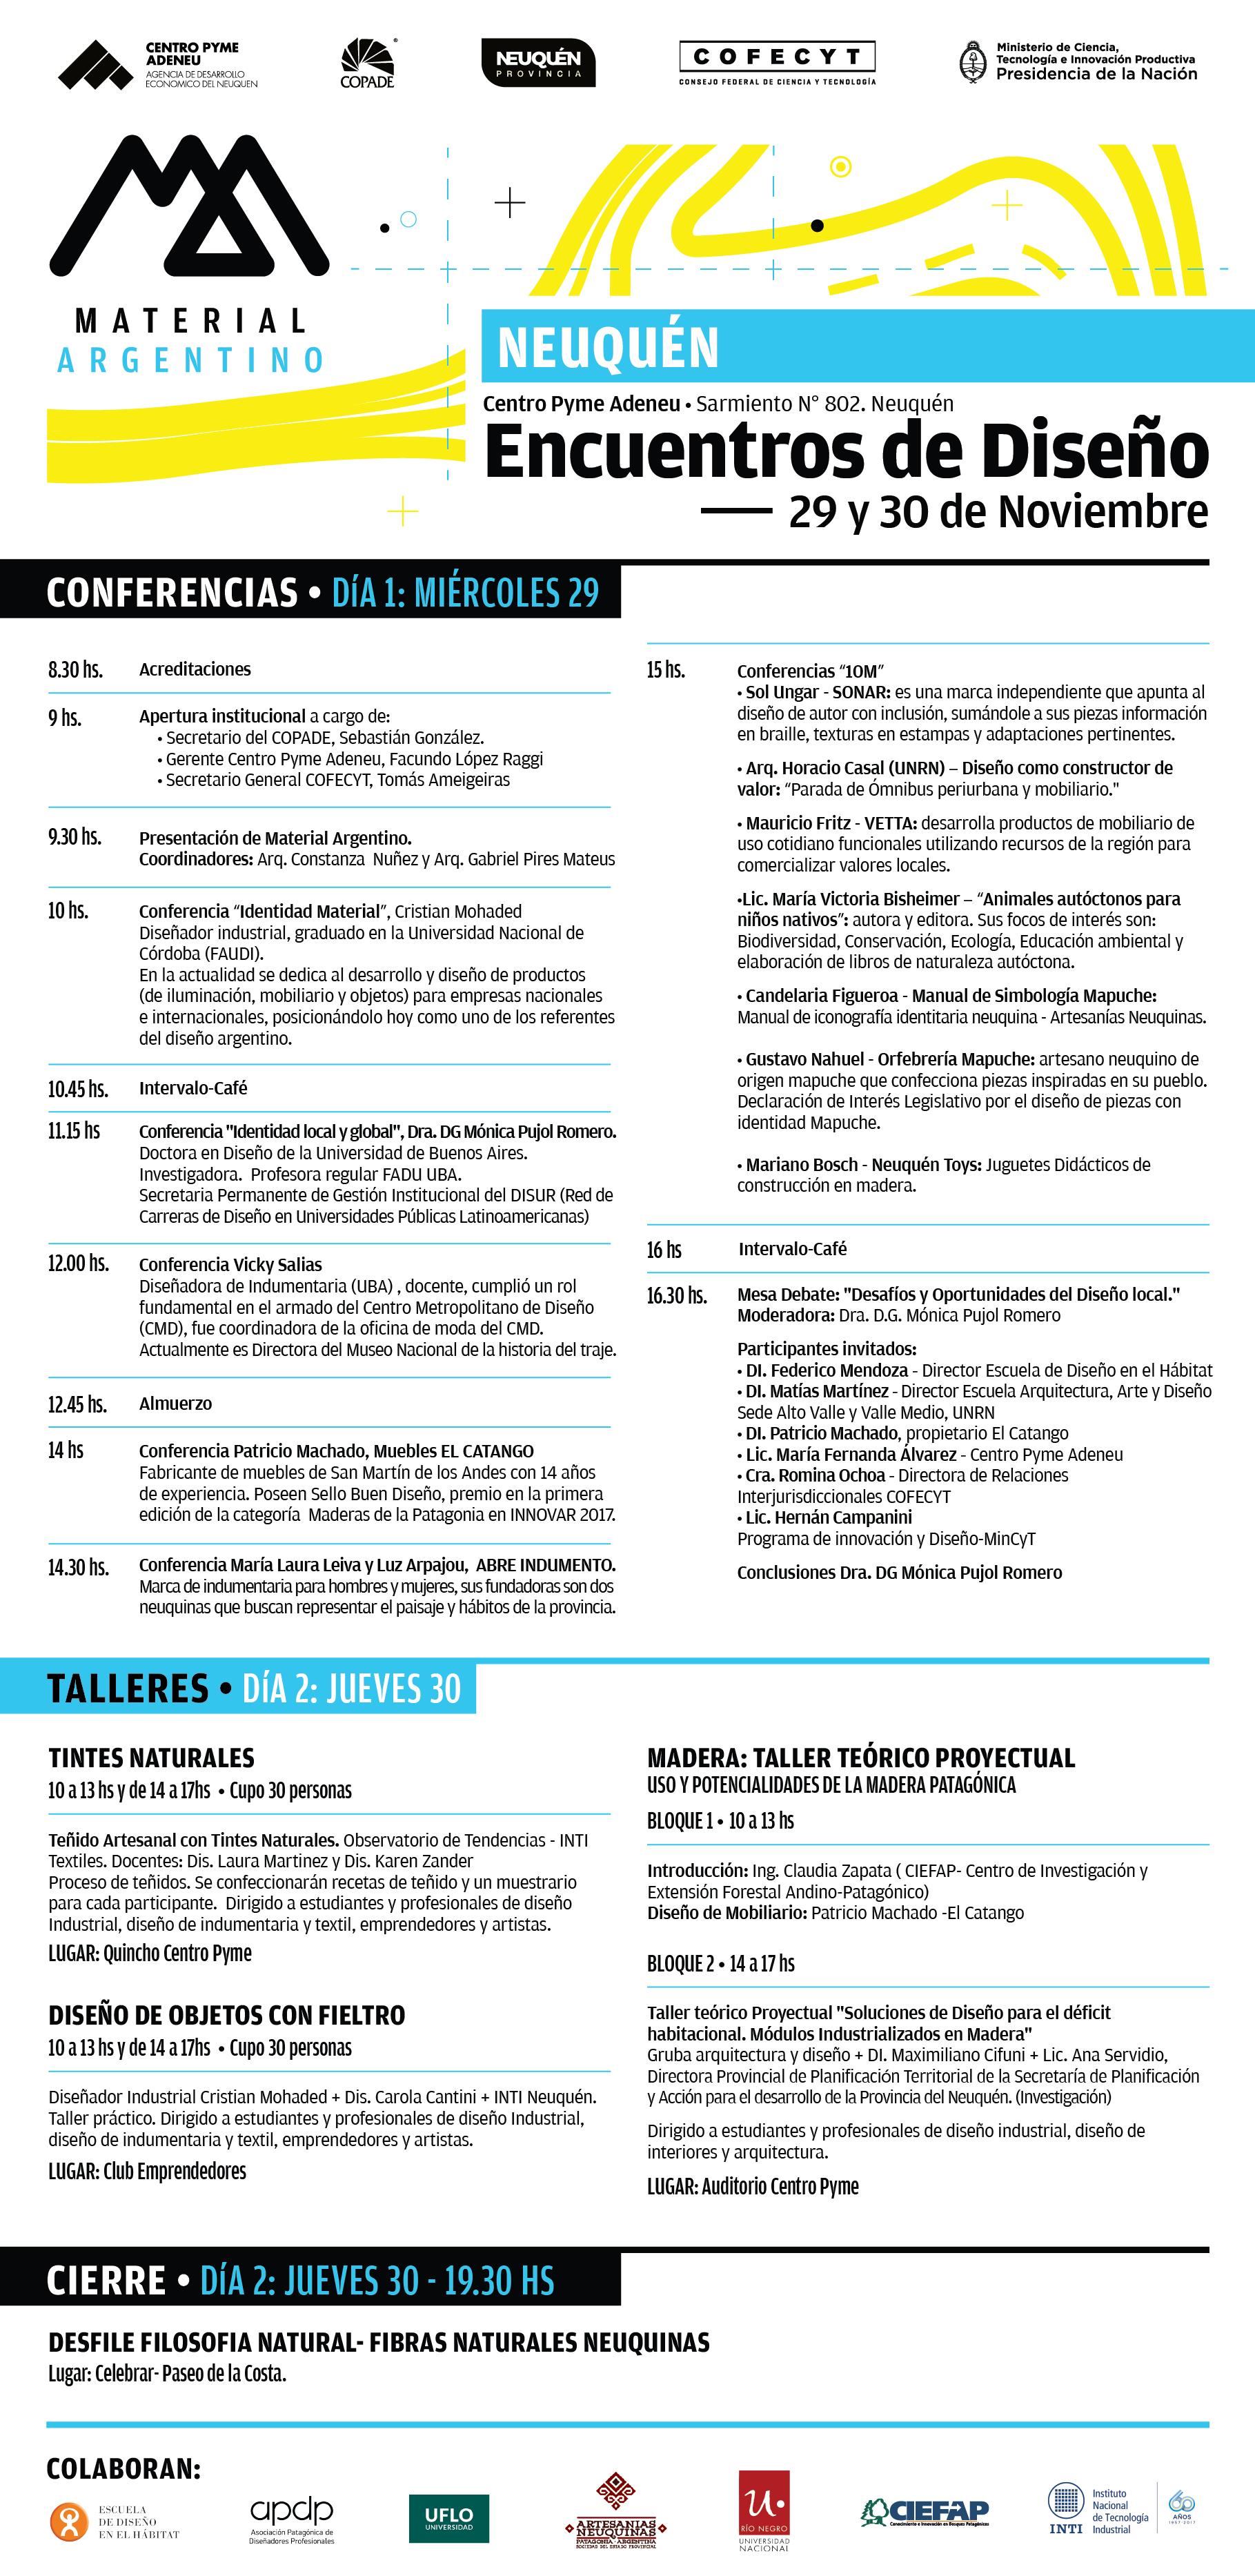 Agenda Neuquen-01.png